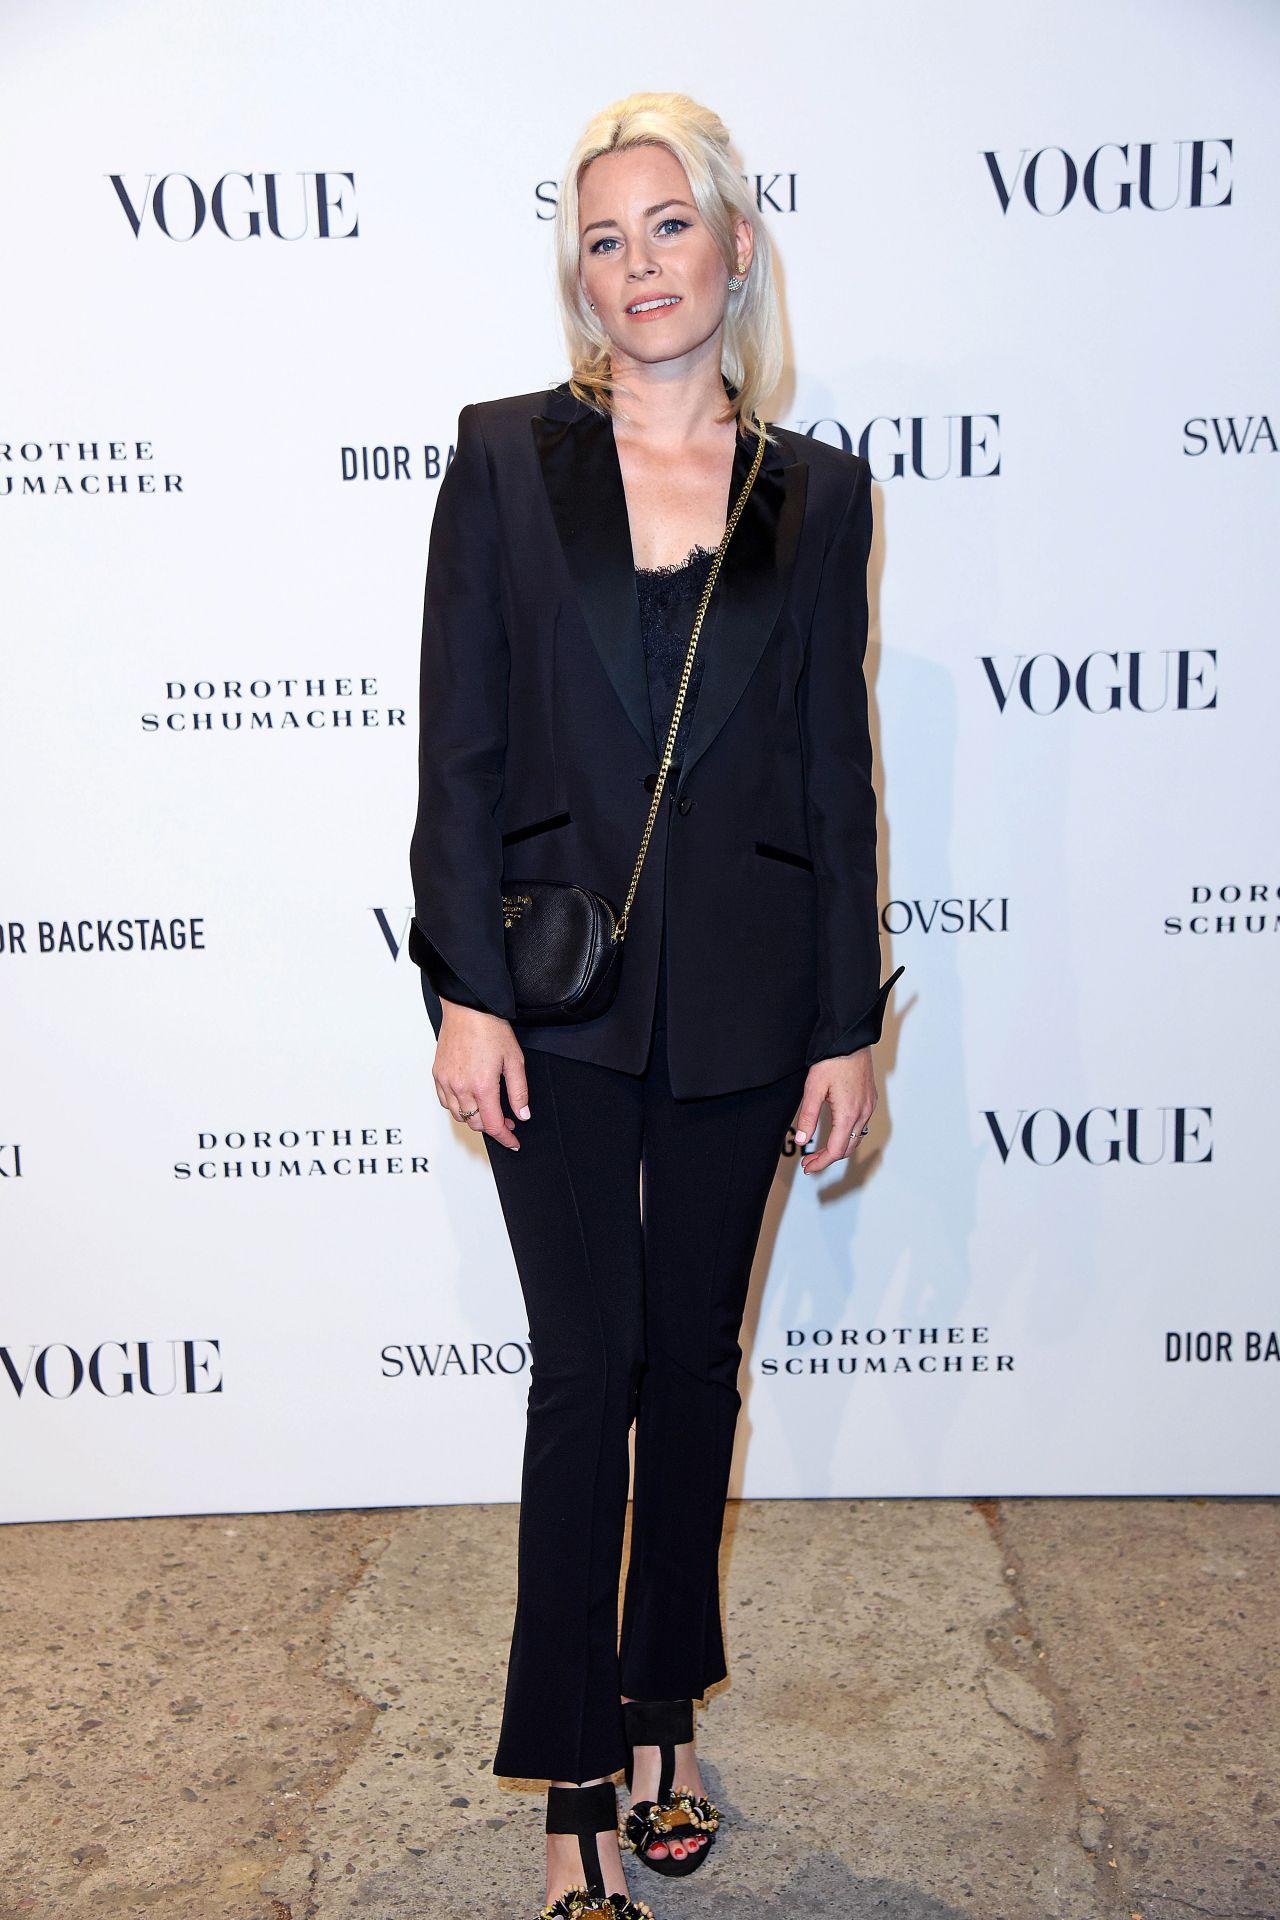 https://celebmafia.com/wp-content/uploads/2018/07/elizabeth-banks-at-vogue-fashion-party-in-berlin-07-06-2018-6.jpg